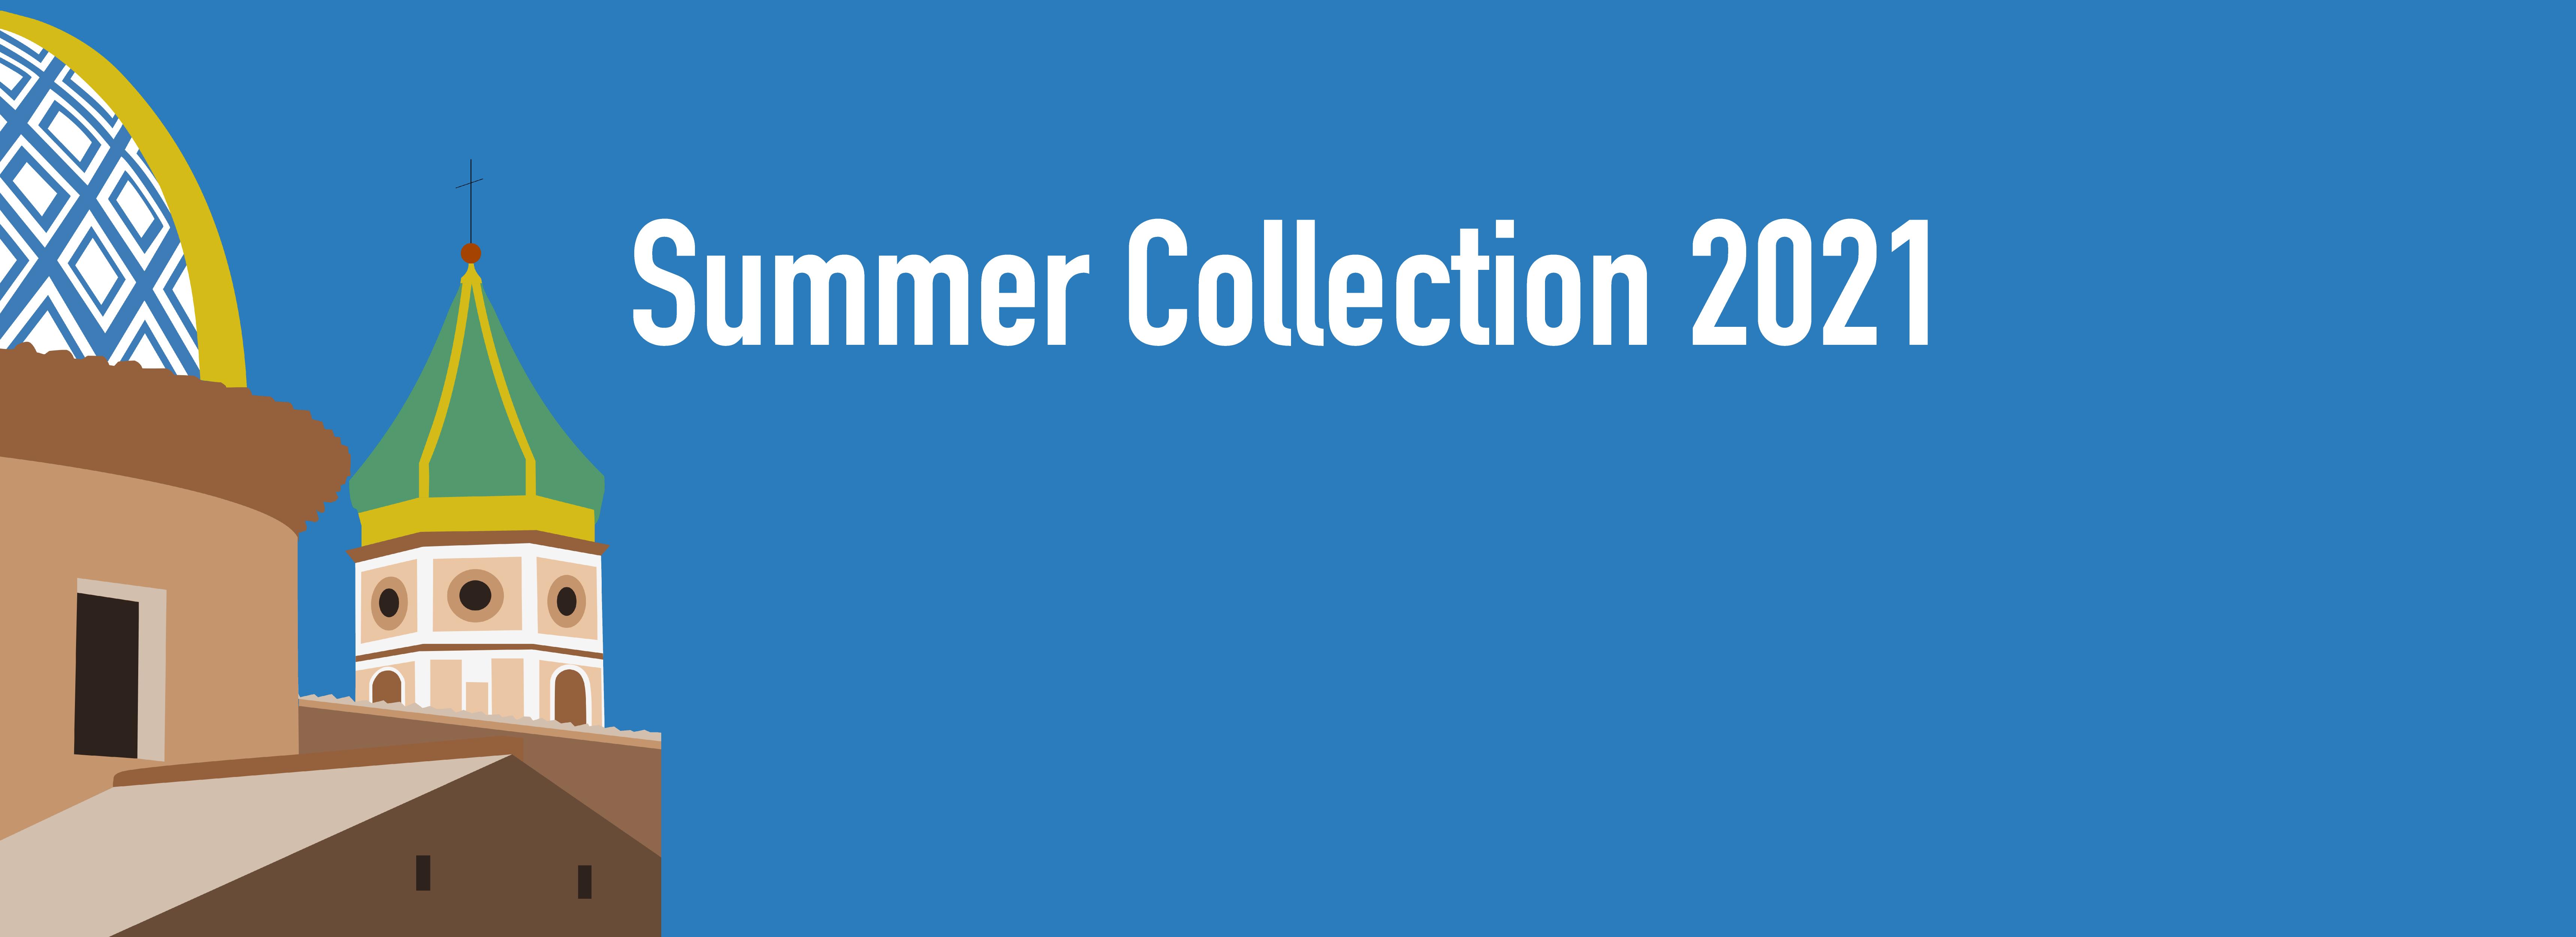 fuori mente banner summer collection 2021